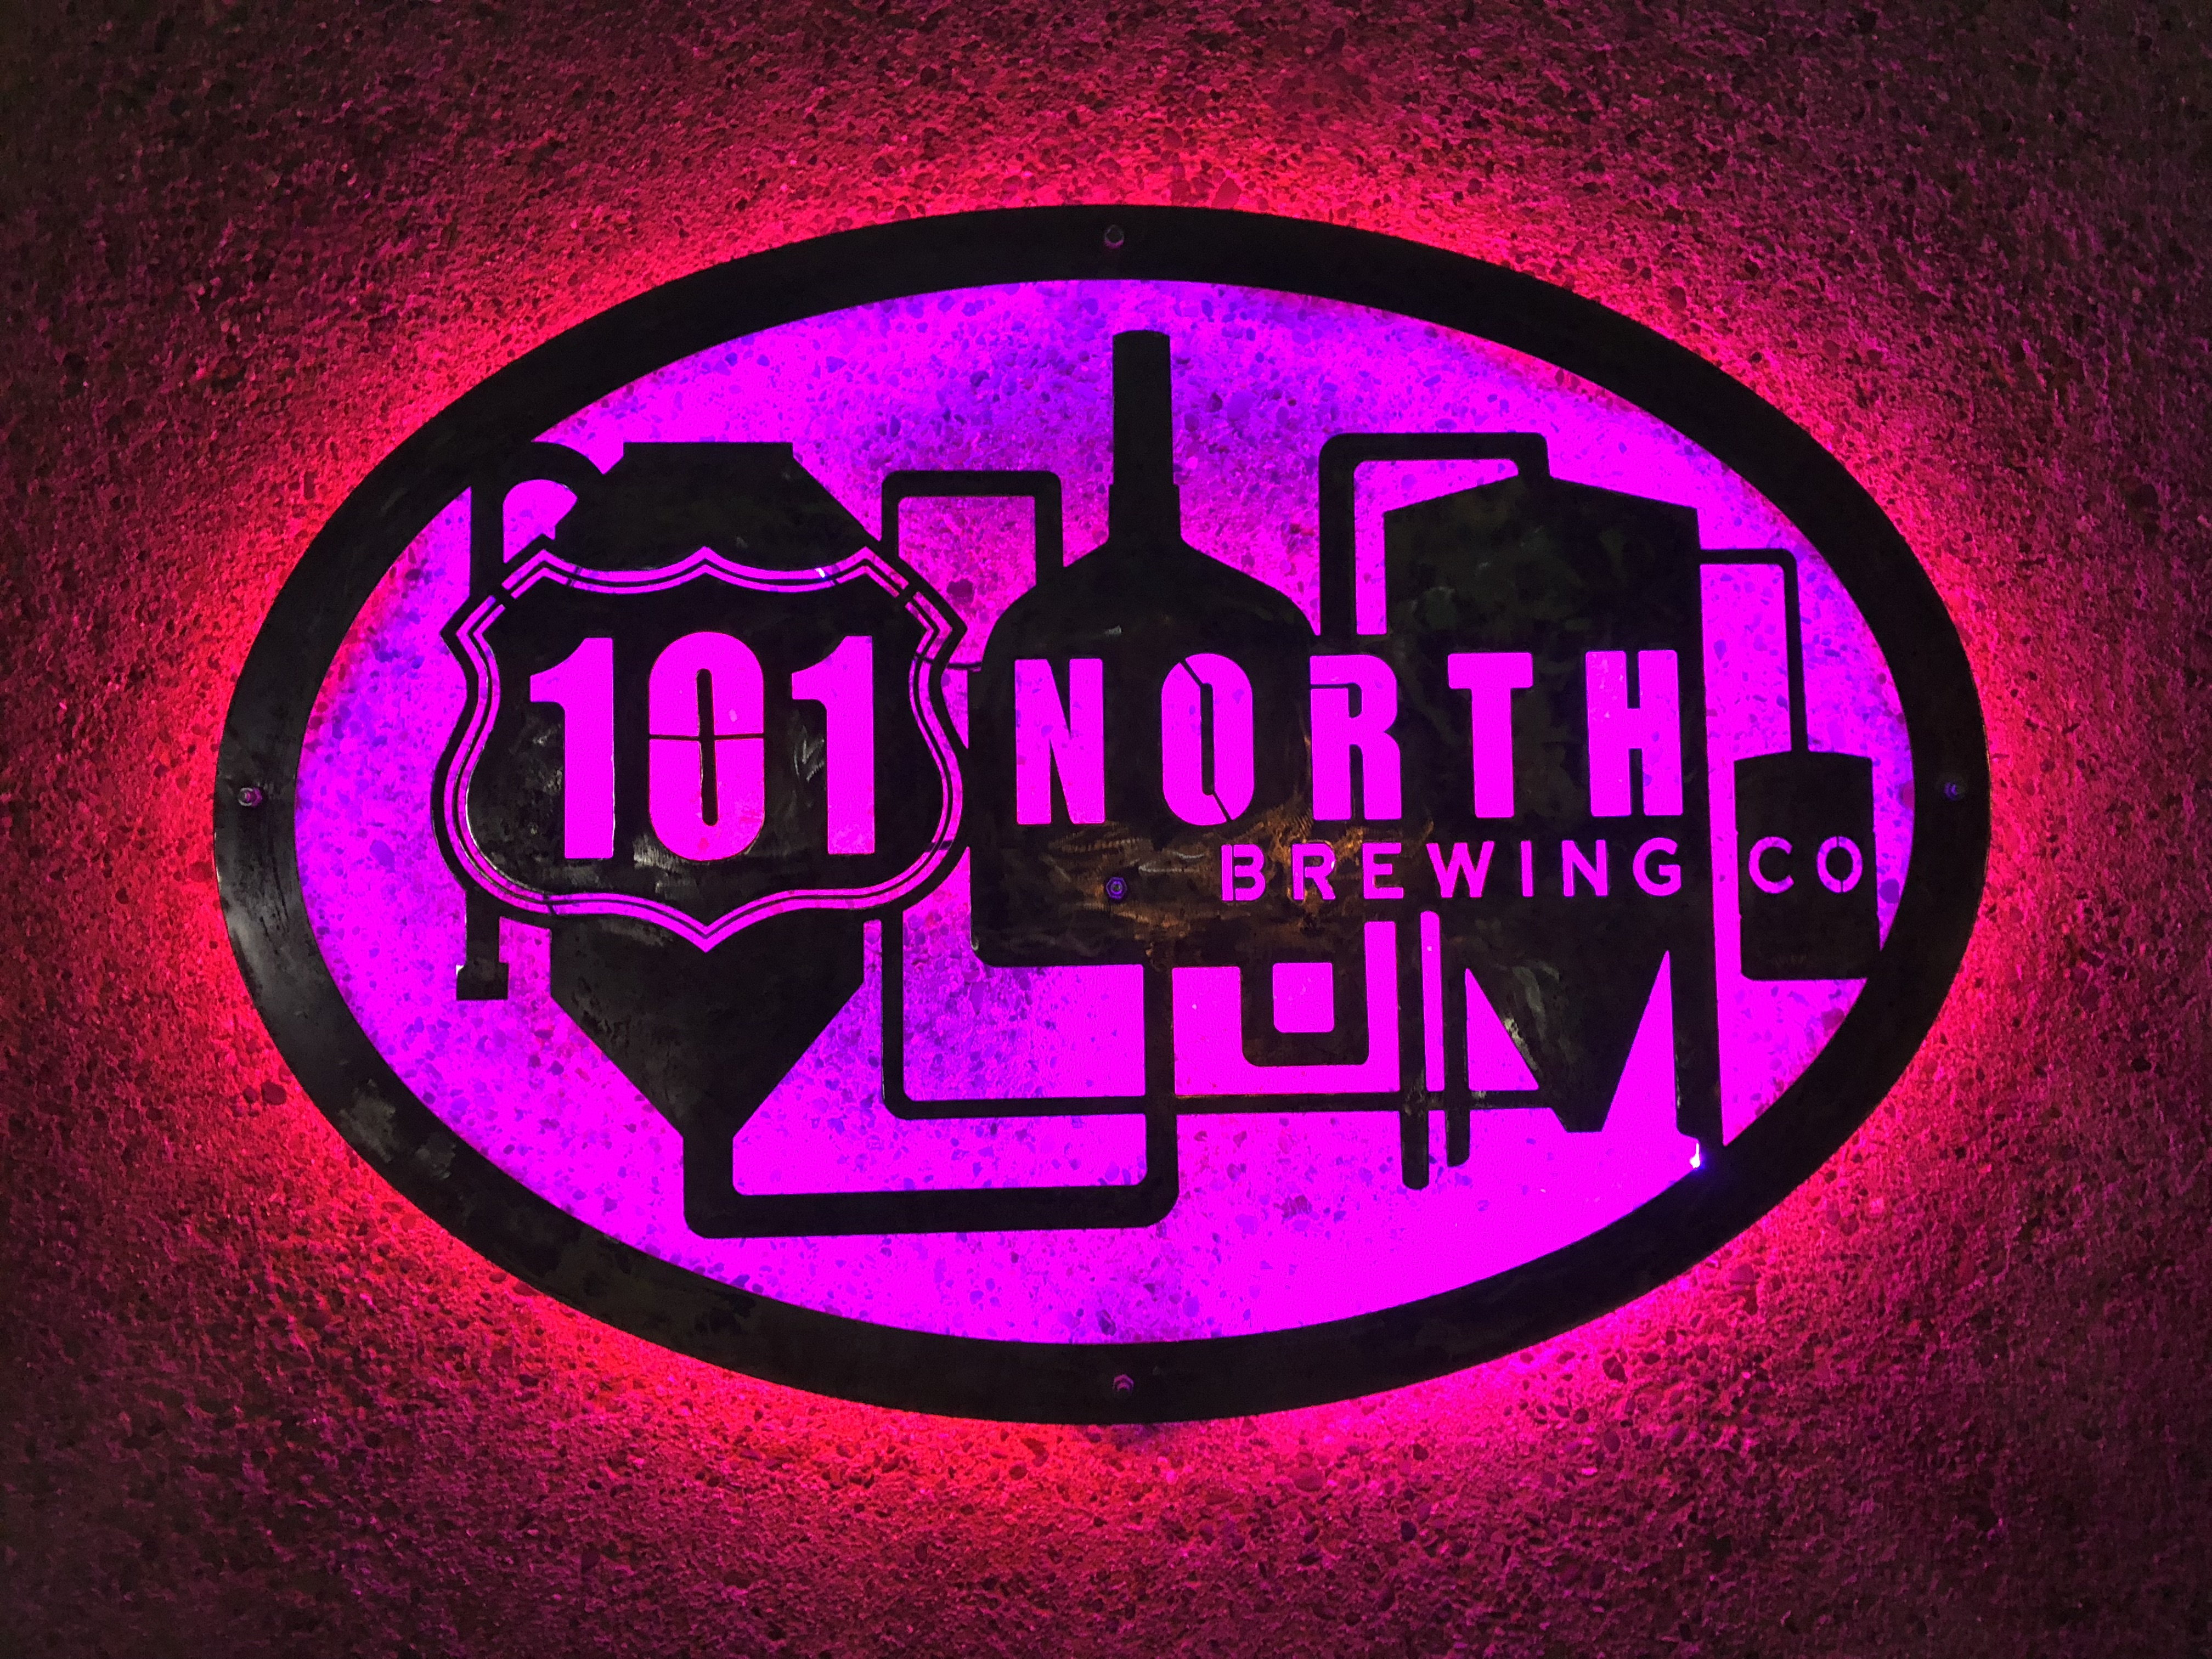 101 North Brewing Company image